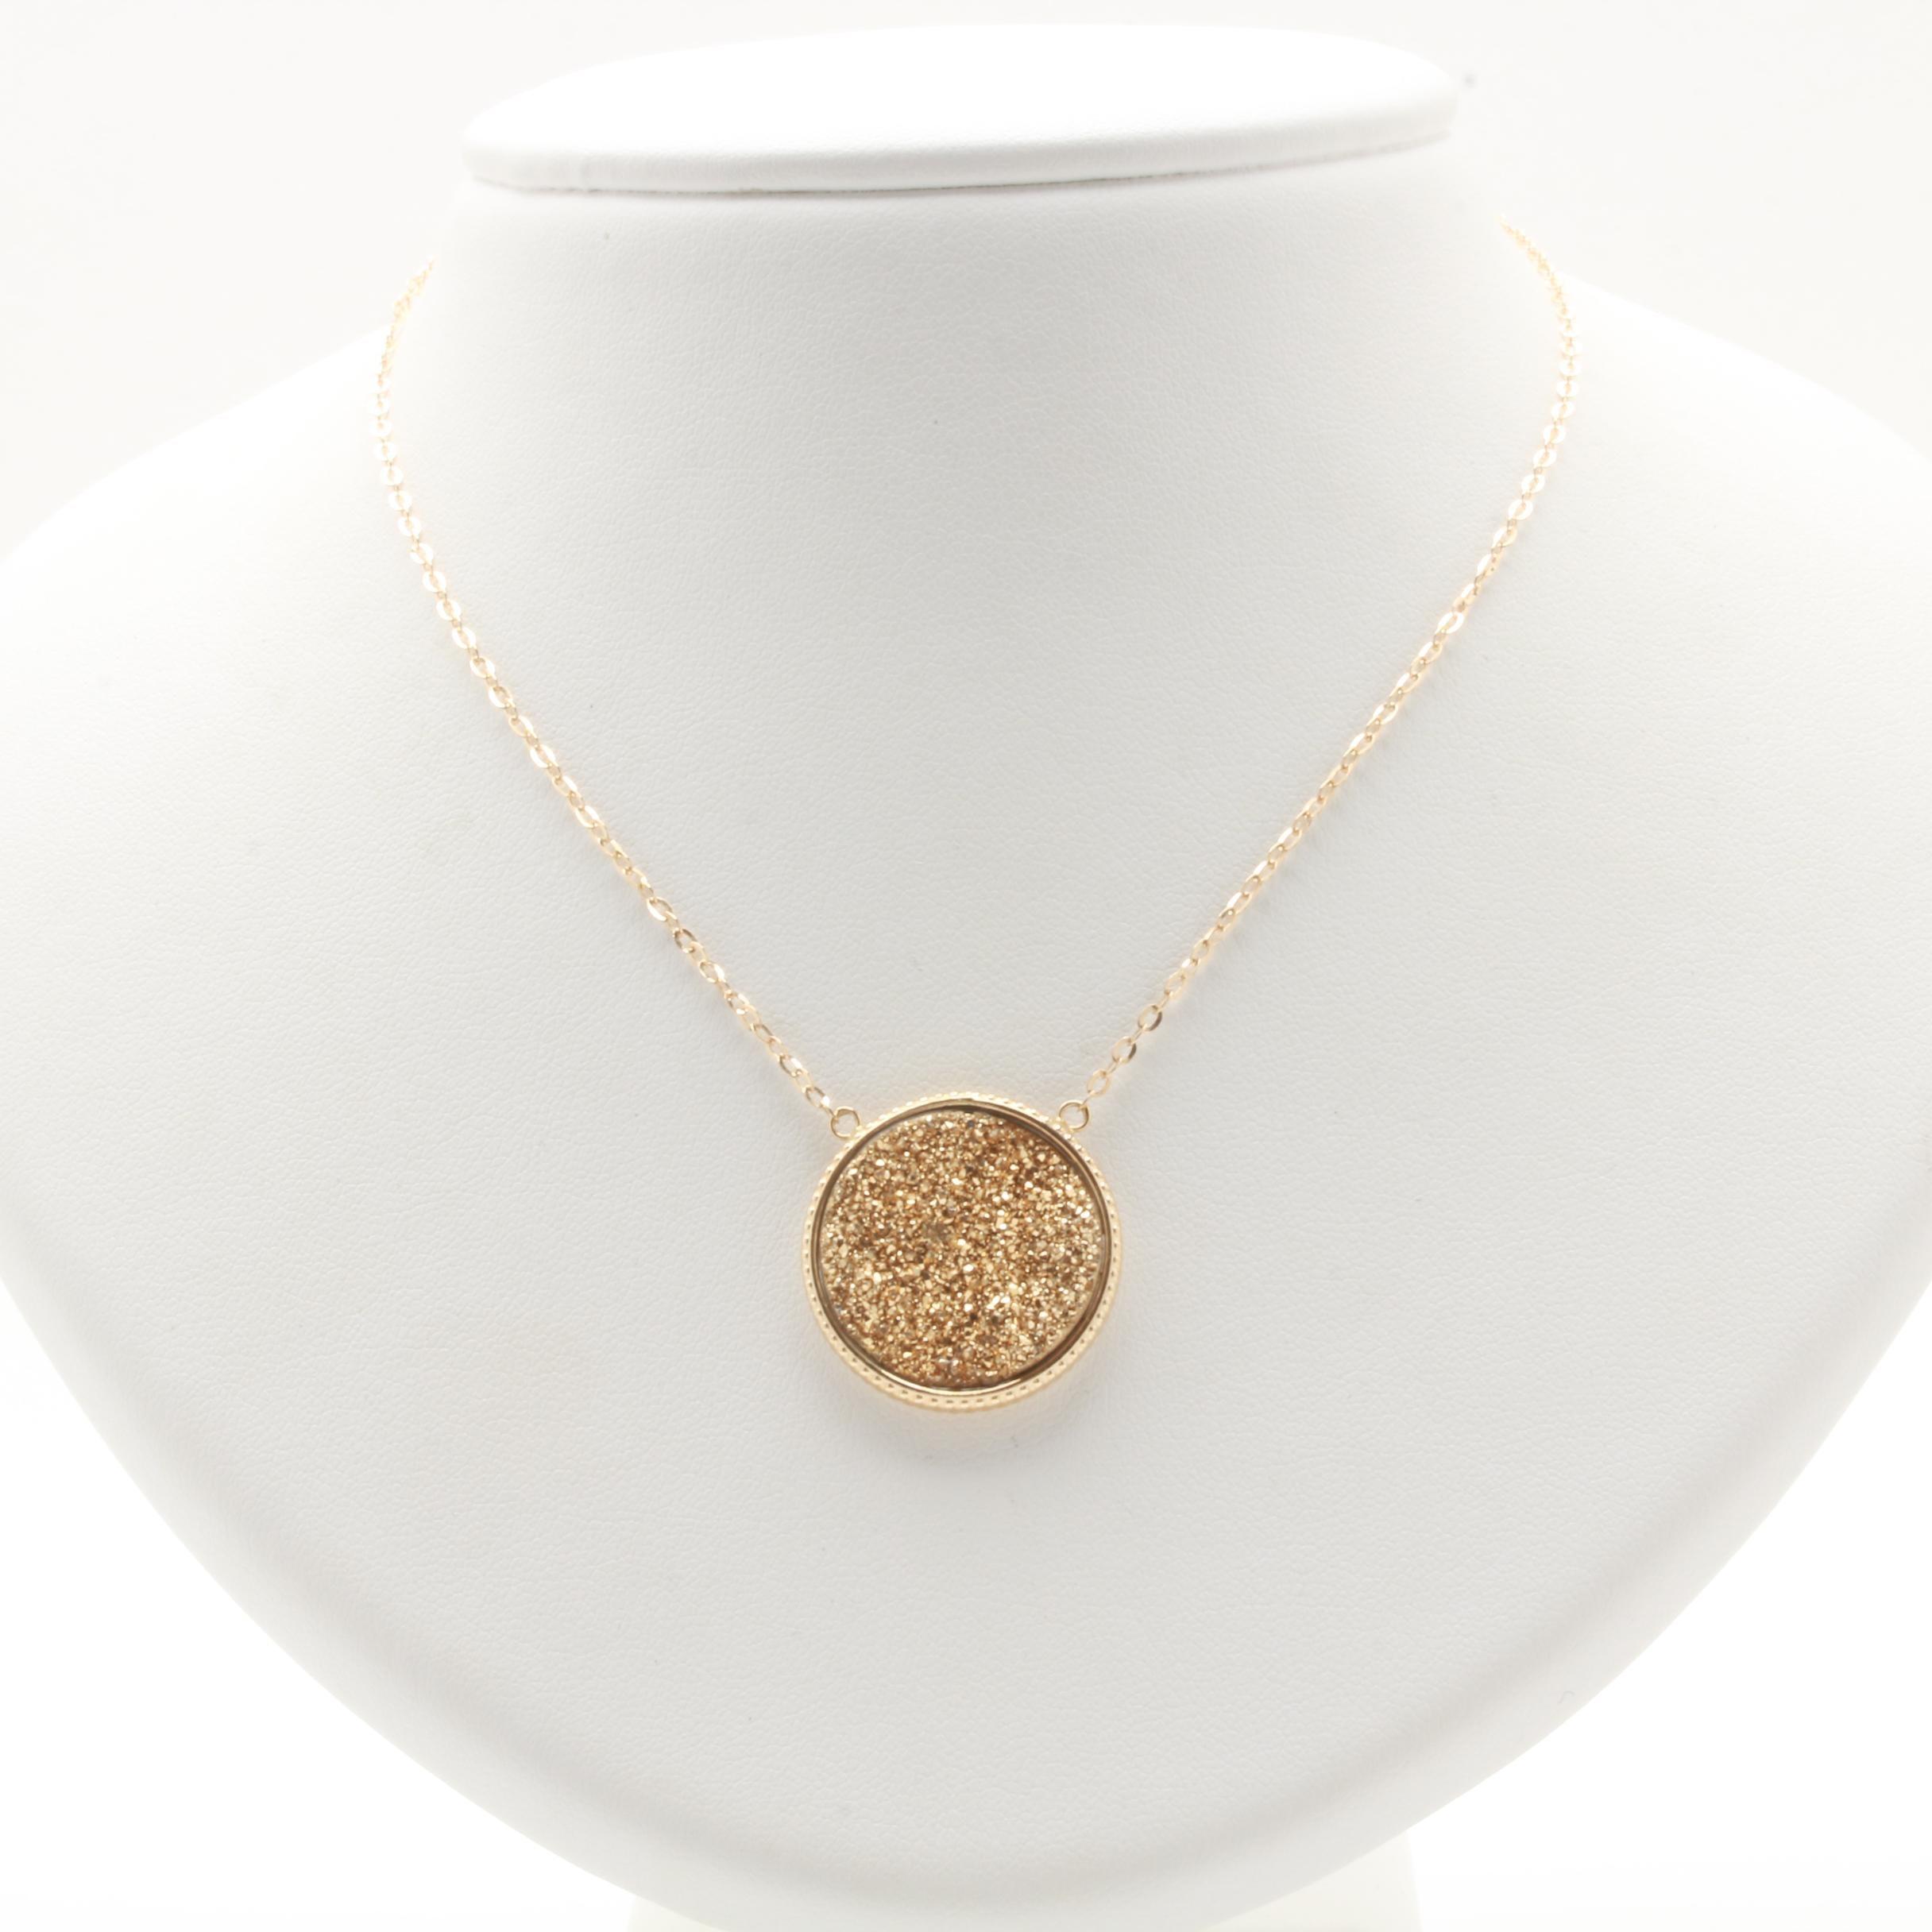 Milor 14K Yellow Gold Druzy Necklace